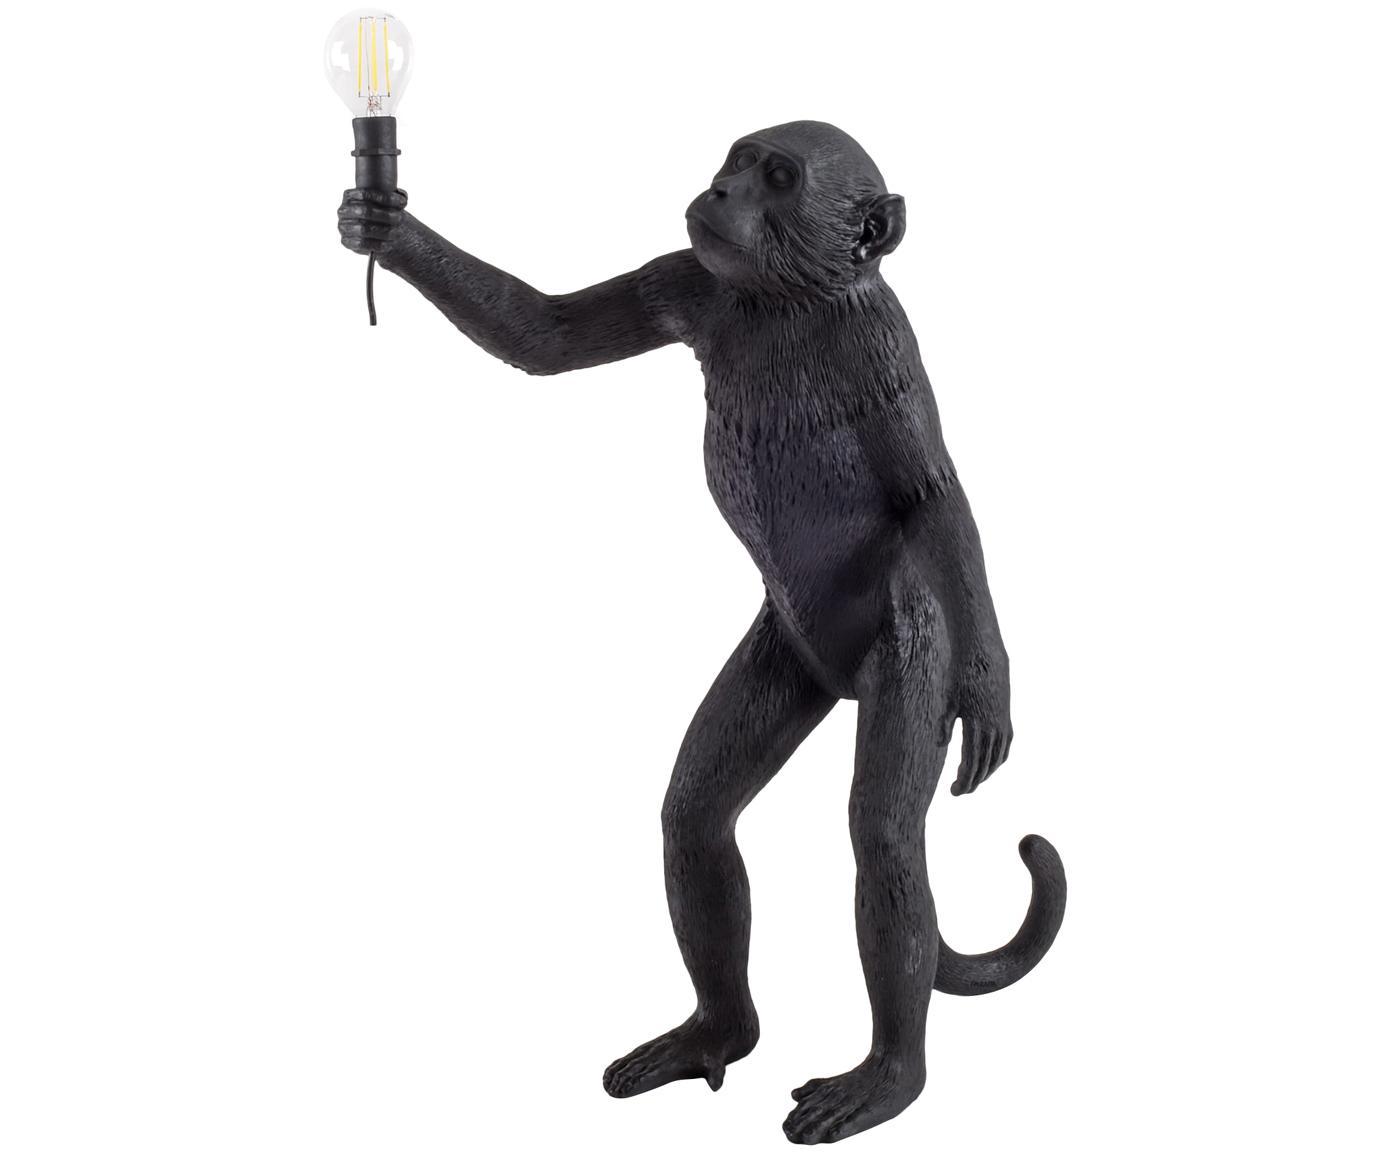 Lámpara de mesa LED para exterior Monkey, Resina, Negro, An 46 x Al 54 cm